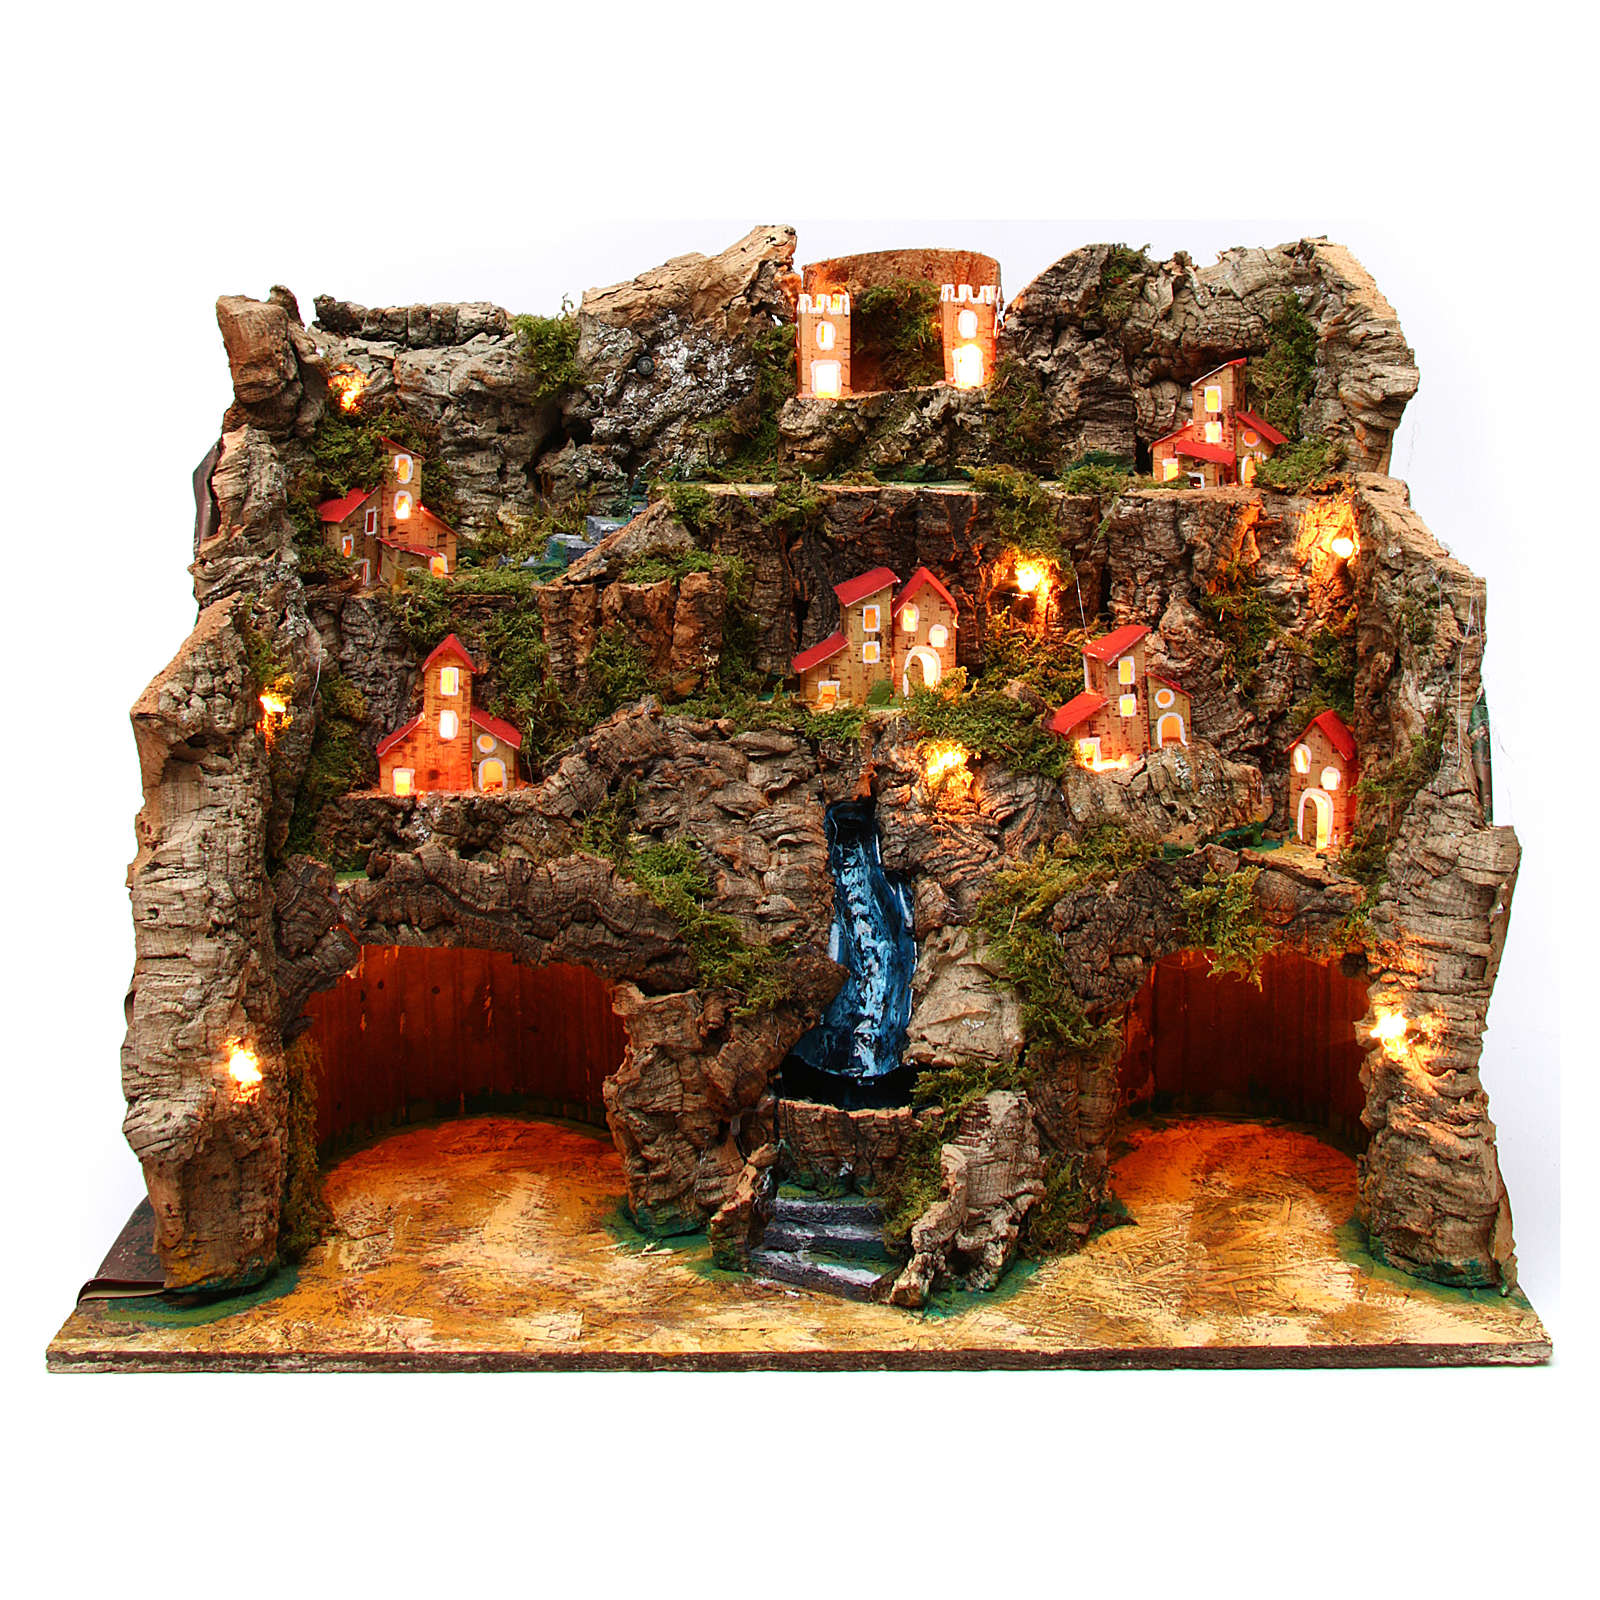 Village with water stream 60x35x50 cm for Nativity Scene 10-12 cm 4